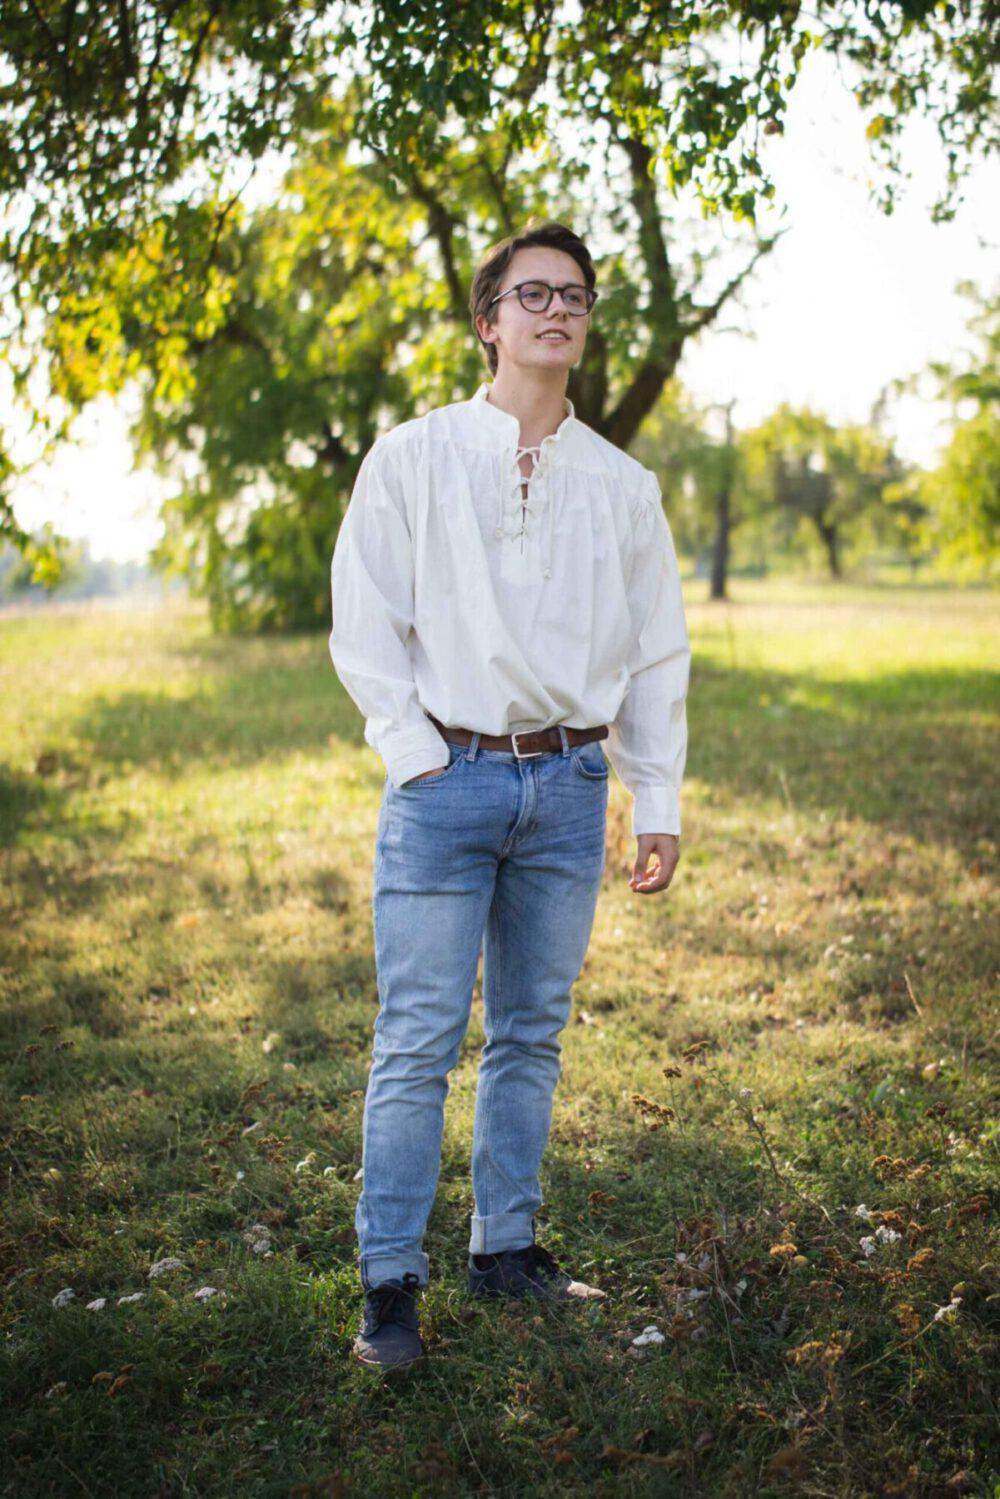 Legeres Stehkragenhemd mit schmalem Ärmelschnitt Modell Adrian